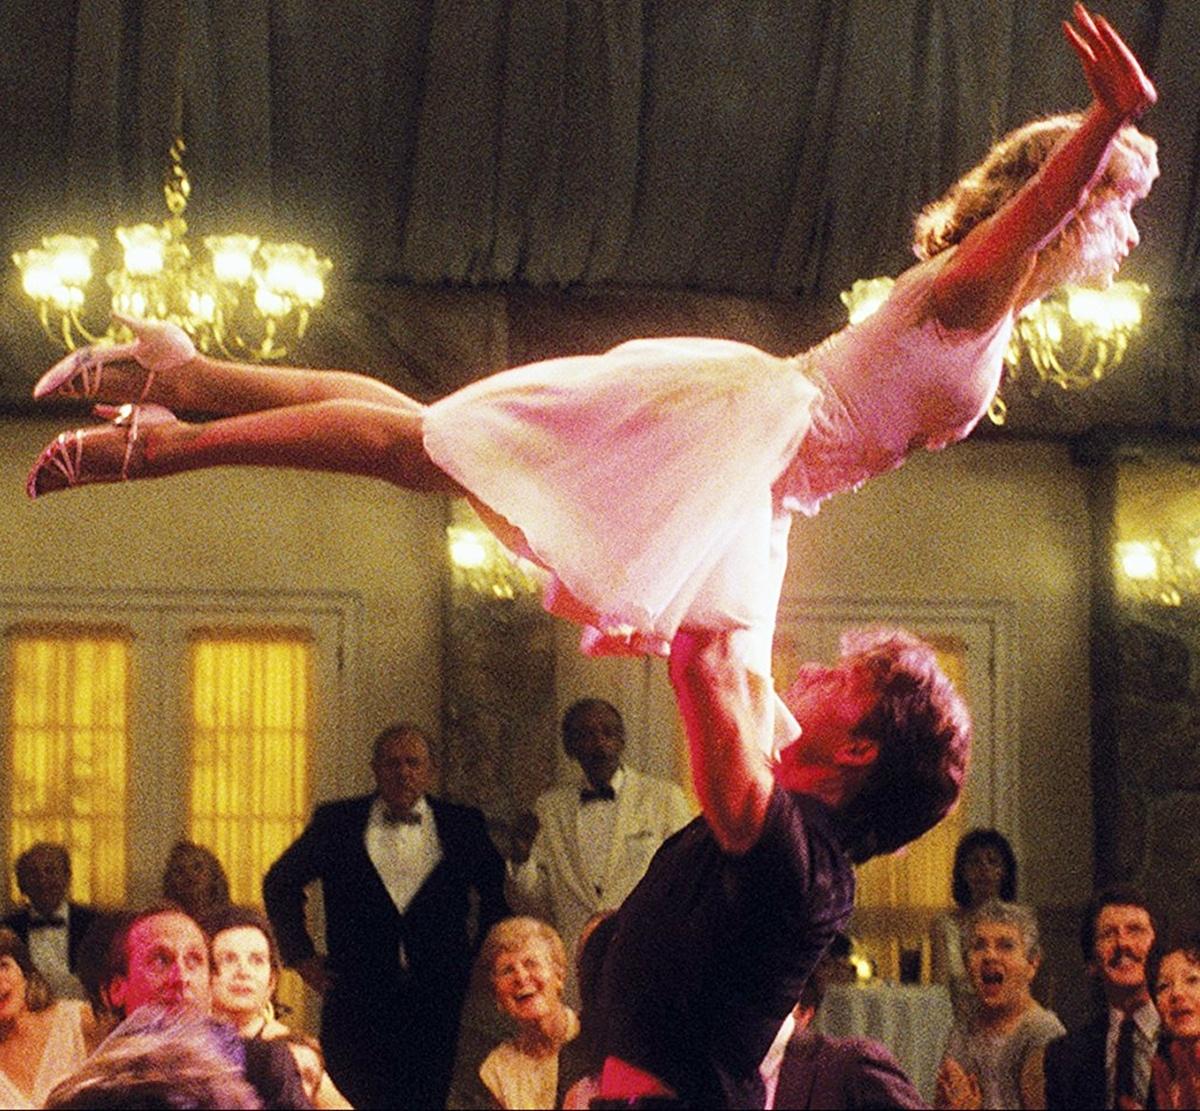 Patrick Swayze, as Johnny Castle, lifts Jennifer Grey as Baby Houseman in Dirty Dancing, 1987